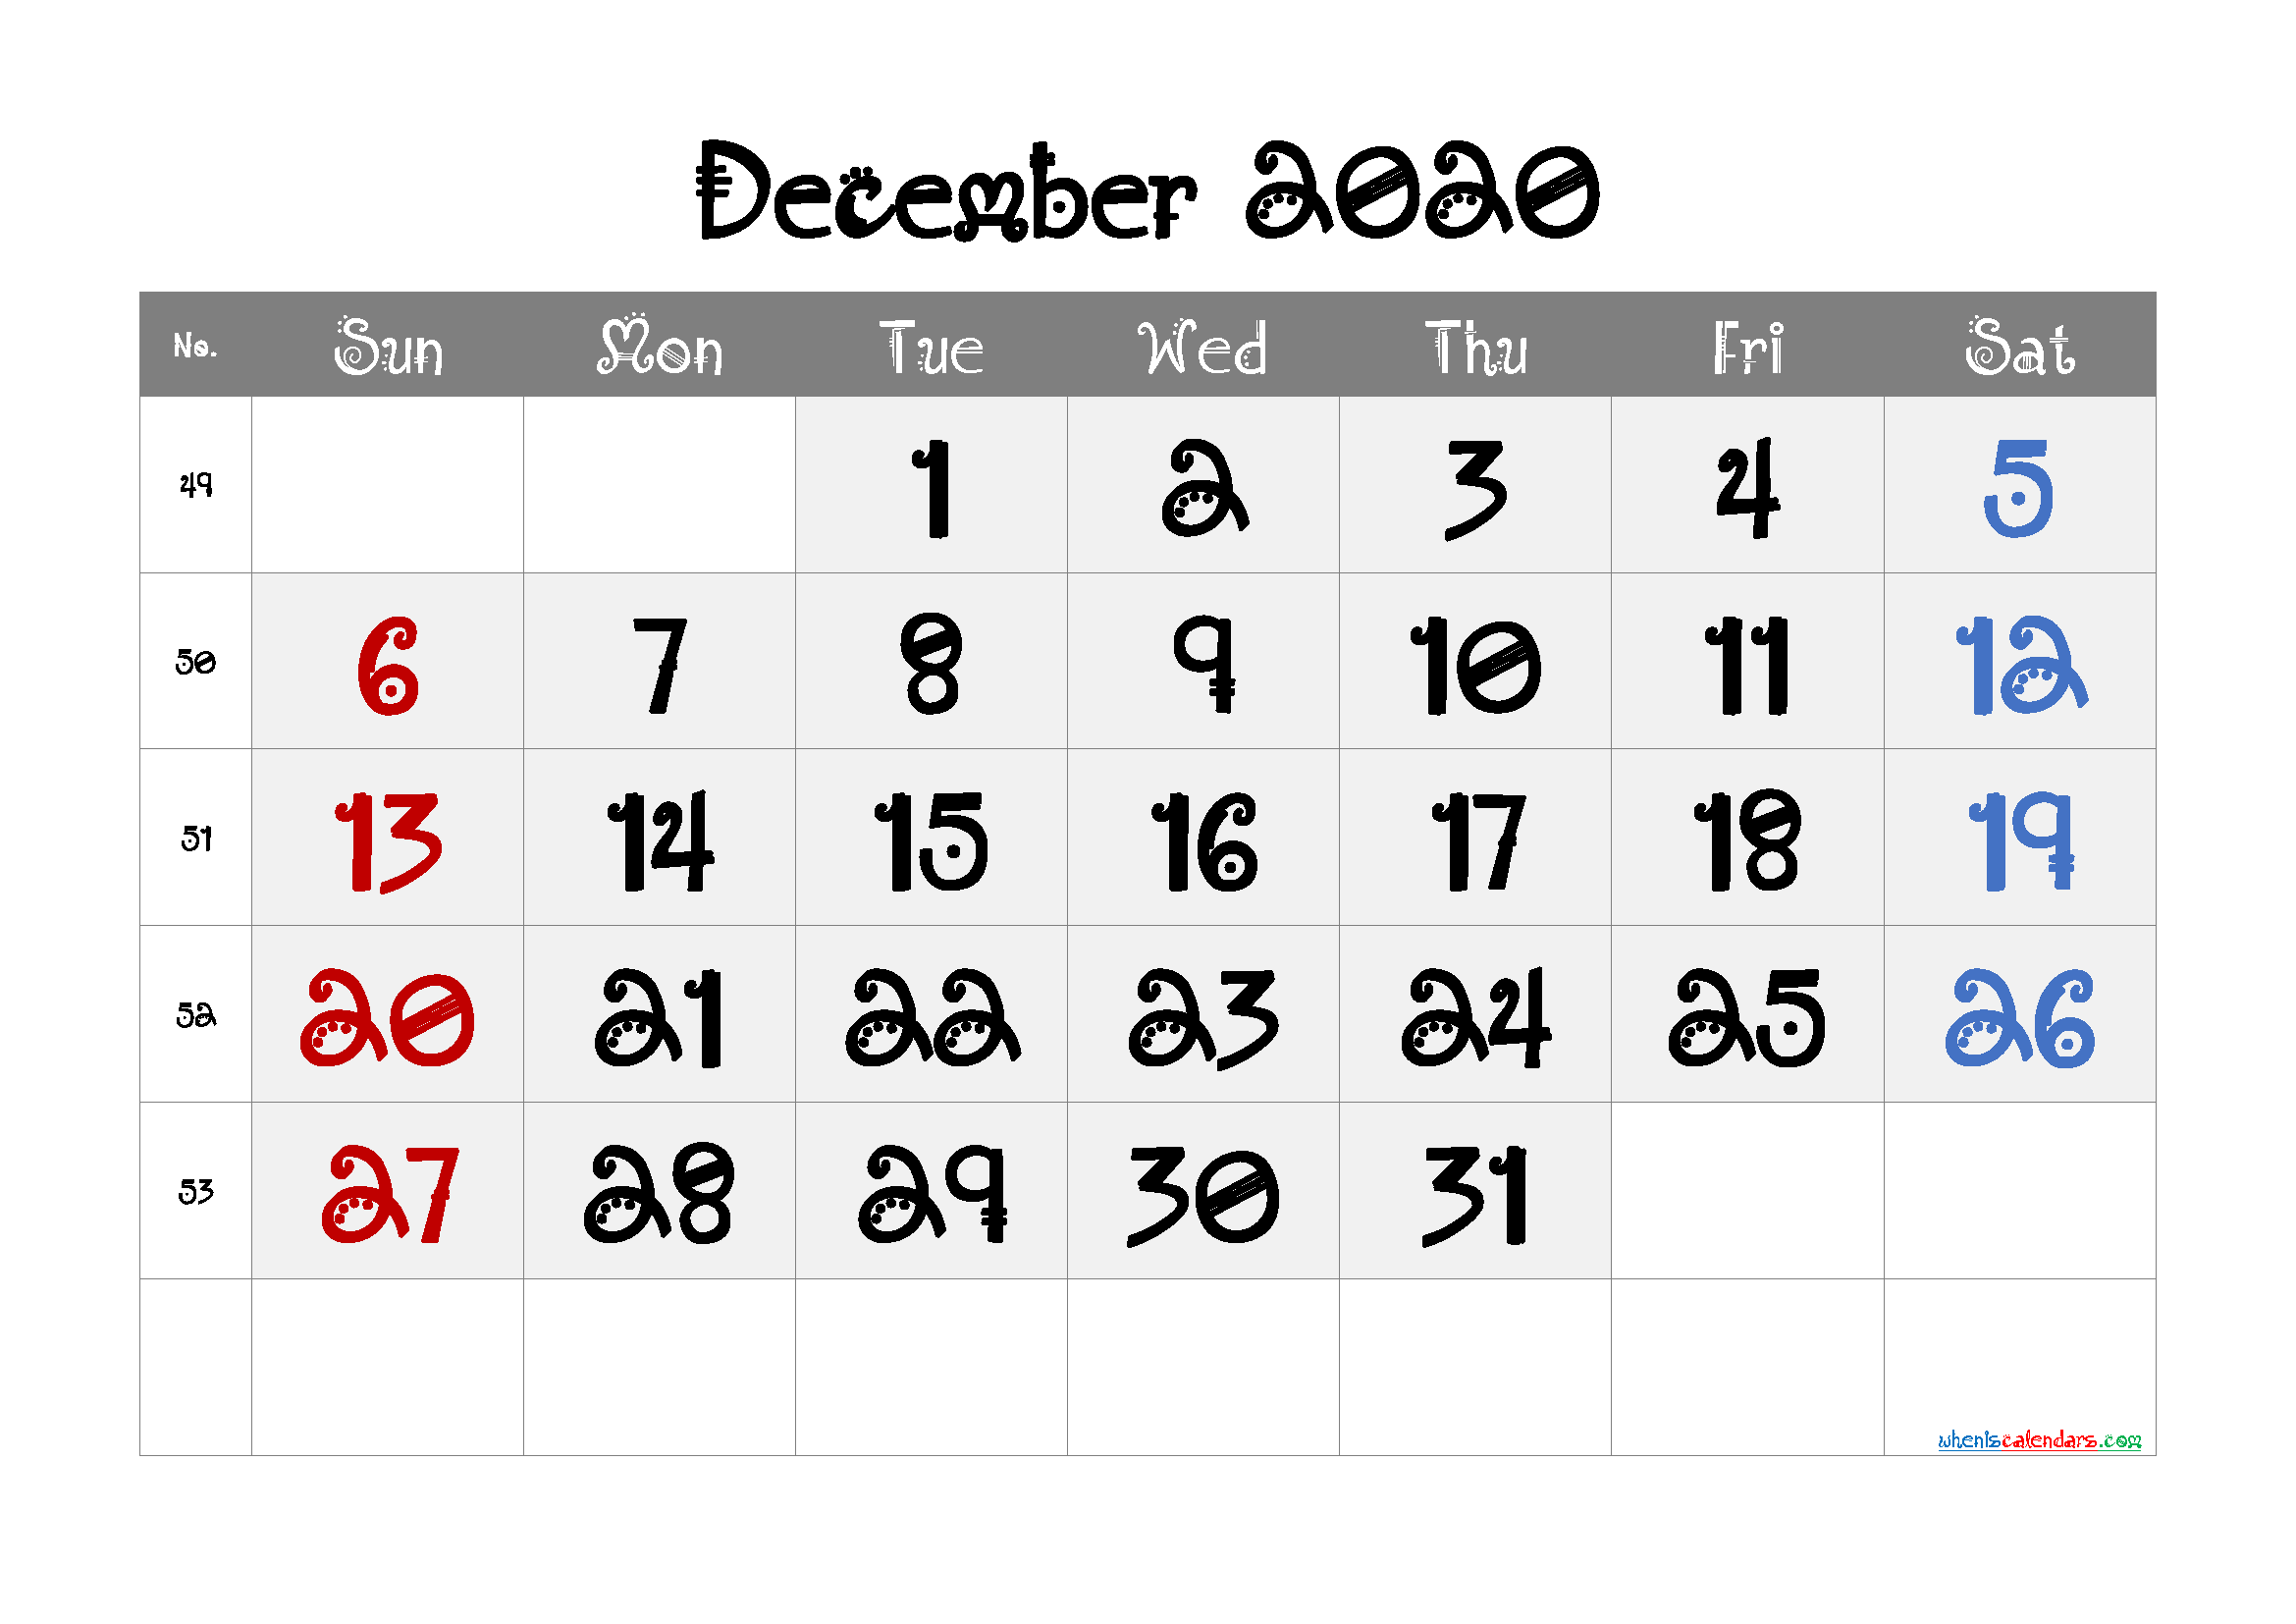 December 2020 Printable Calendar Free